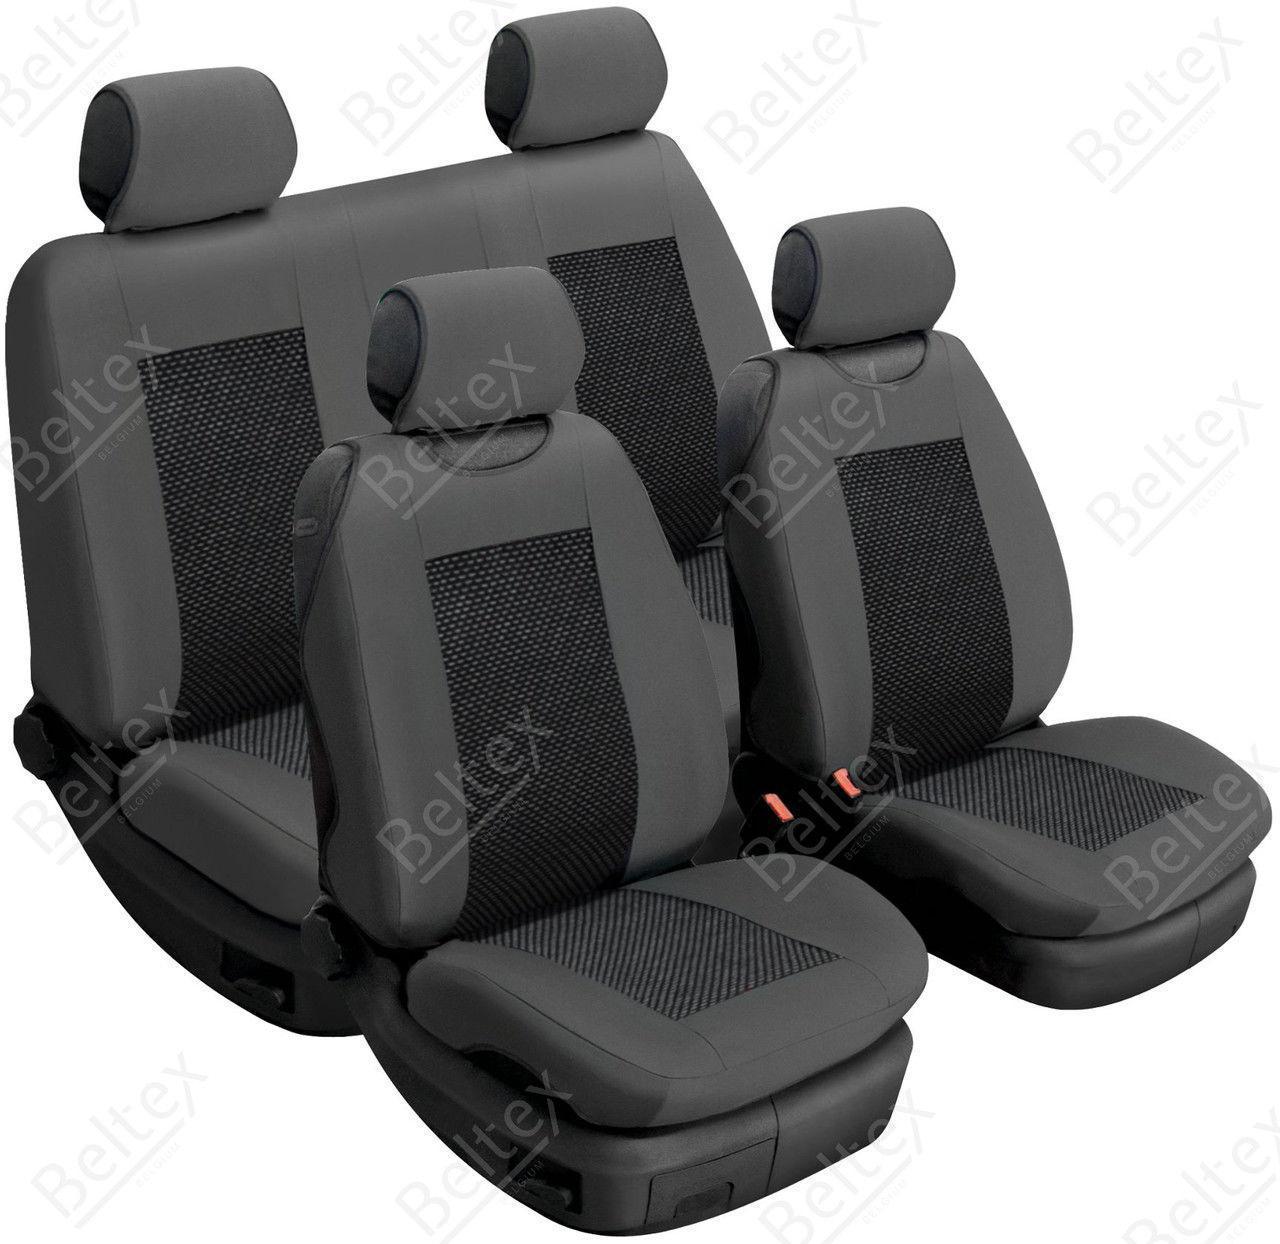 Майки/чехлы на сиденья Мазда СХ 7 (Mazda CX-7)